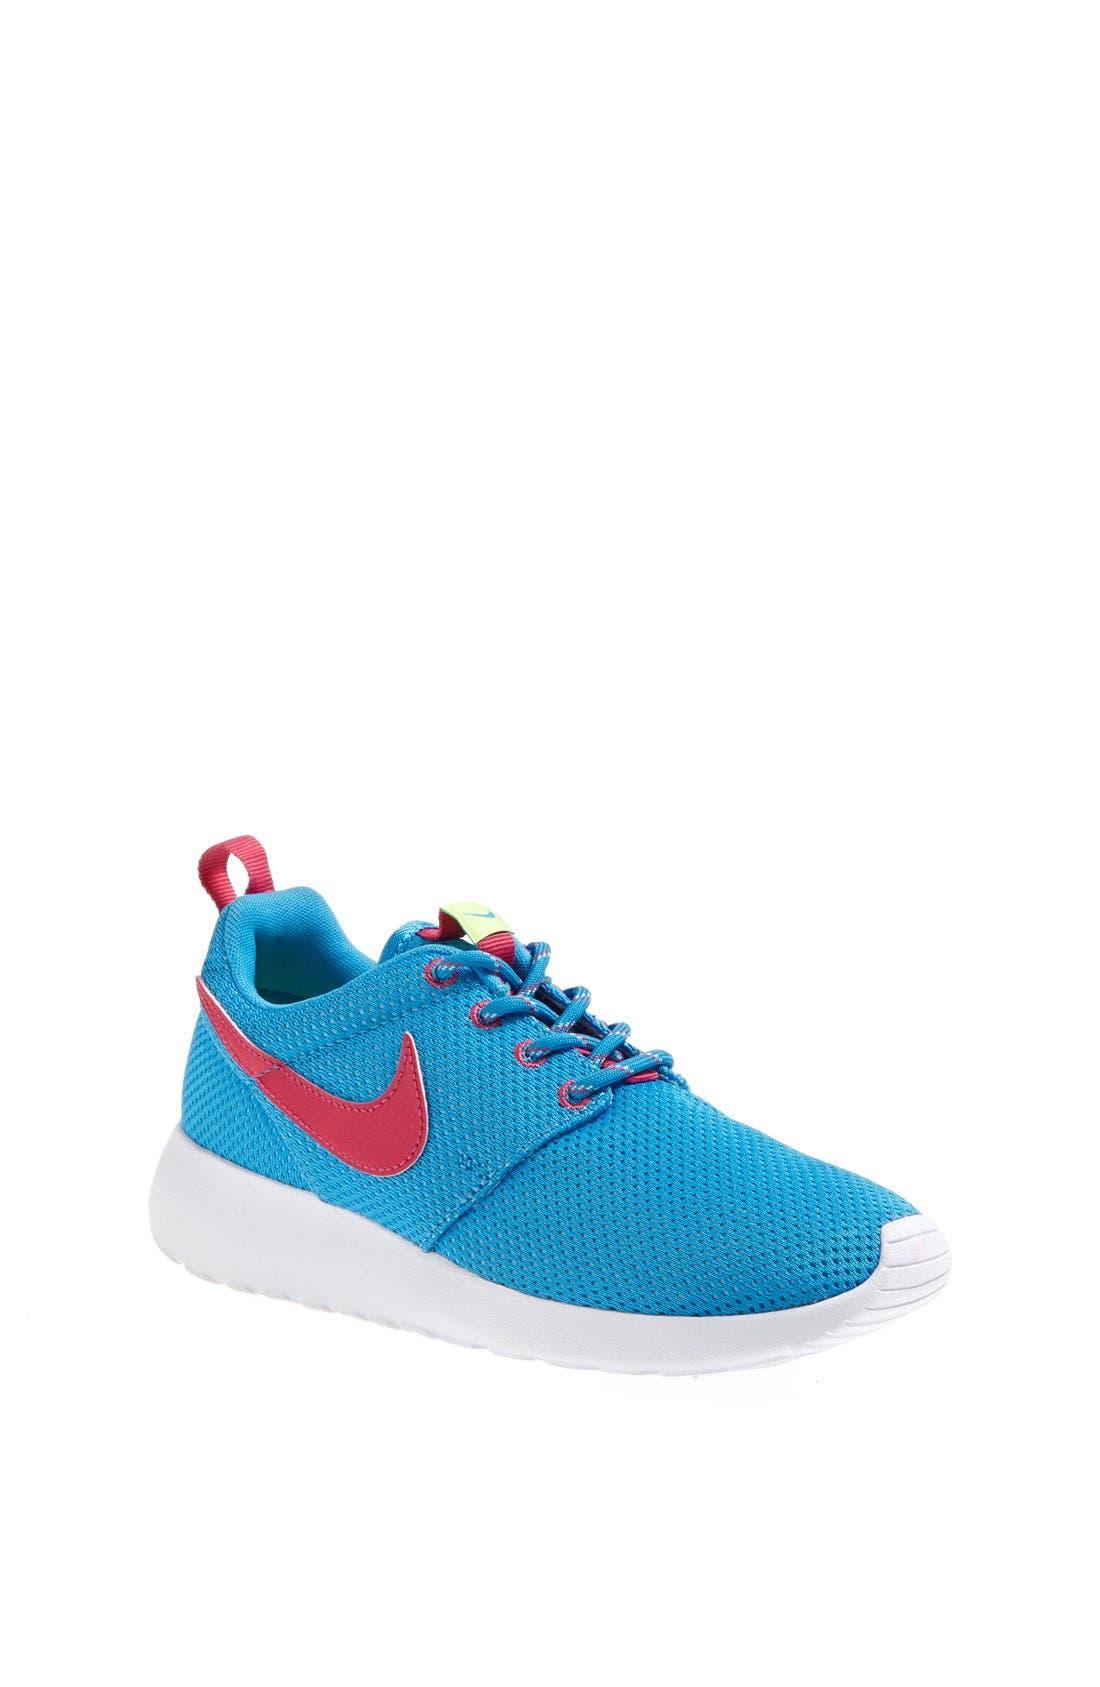 'Roshe Run' Athletic Shoe,                             Main thumbnail 29, color,